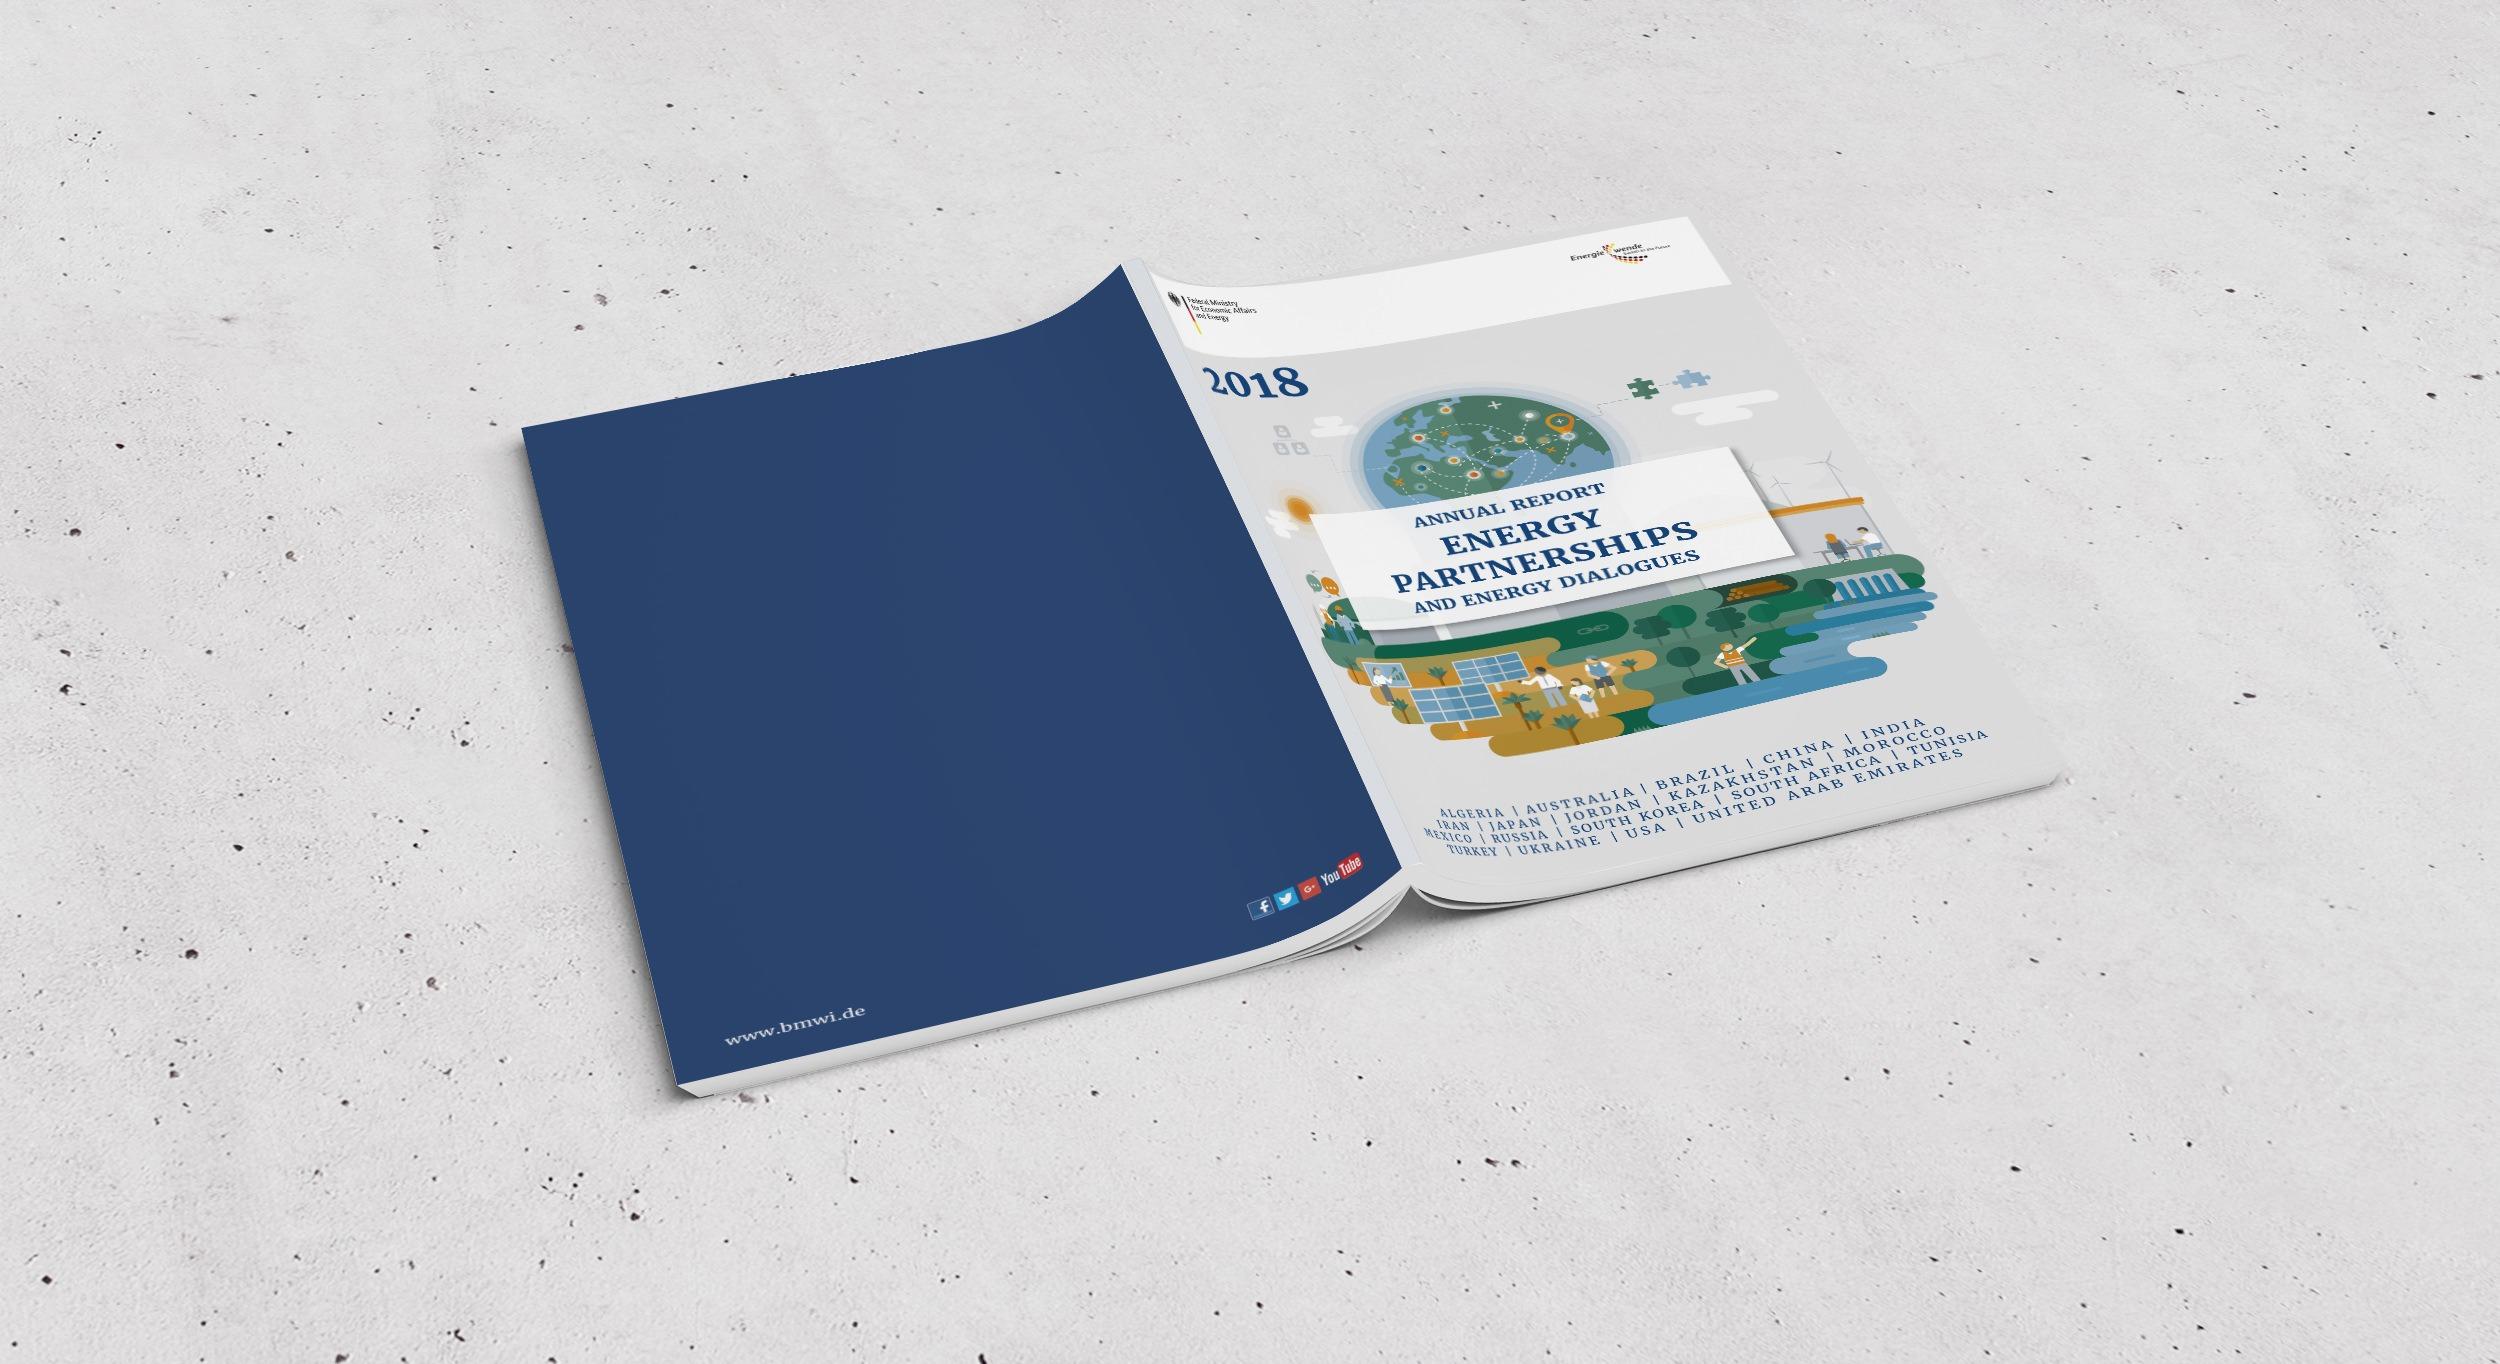 BMWi – Jahresbericht Energiepartnerschaften | Editorial Design, Corporate Publishing